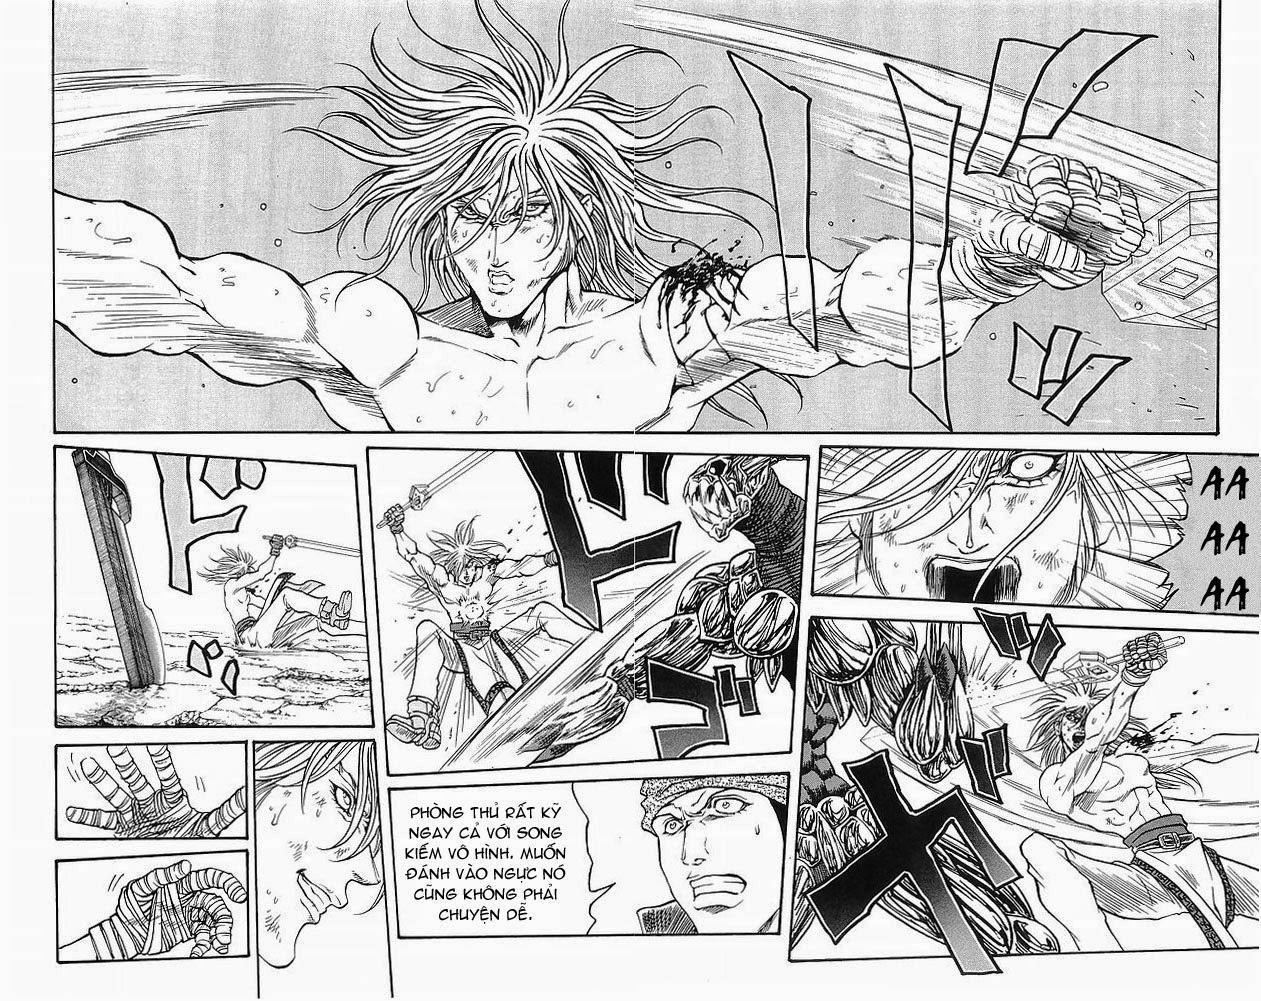 Vua Trên Biển – Coco Full Ahead chap 207 Trang 9 - Mangak.info